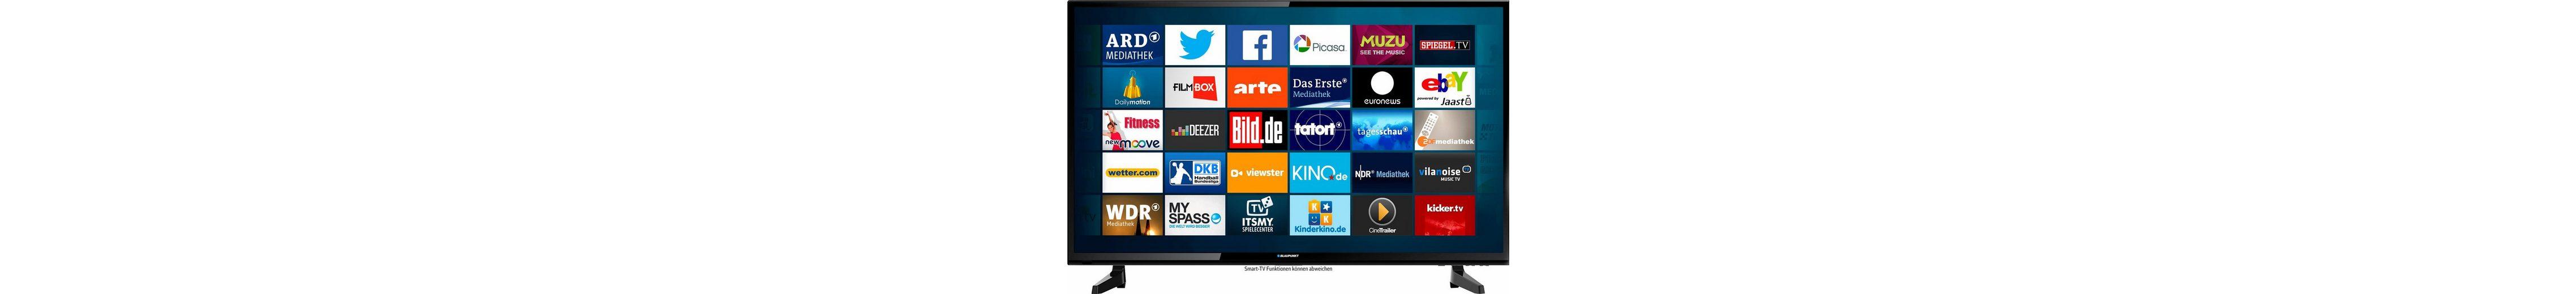 Blaupunkt B49Z148T2CS Smart, LED Fernseher, 123 cm (49 Zoll), 1080p (Full HD), Smart-TV